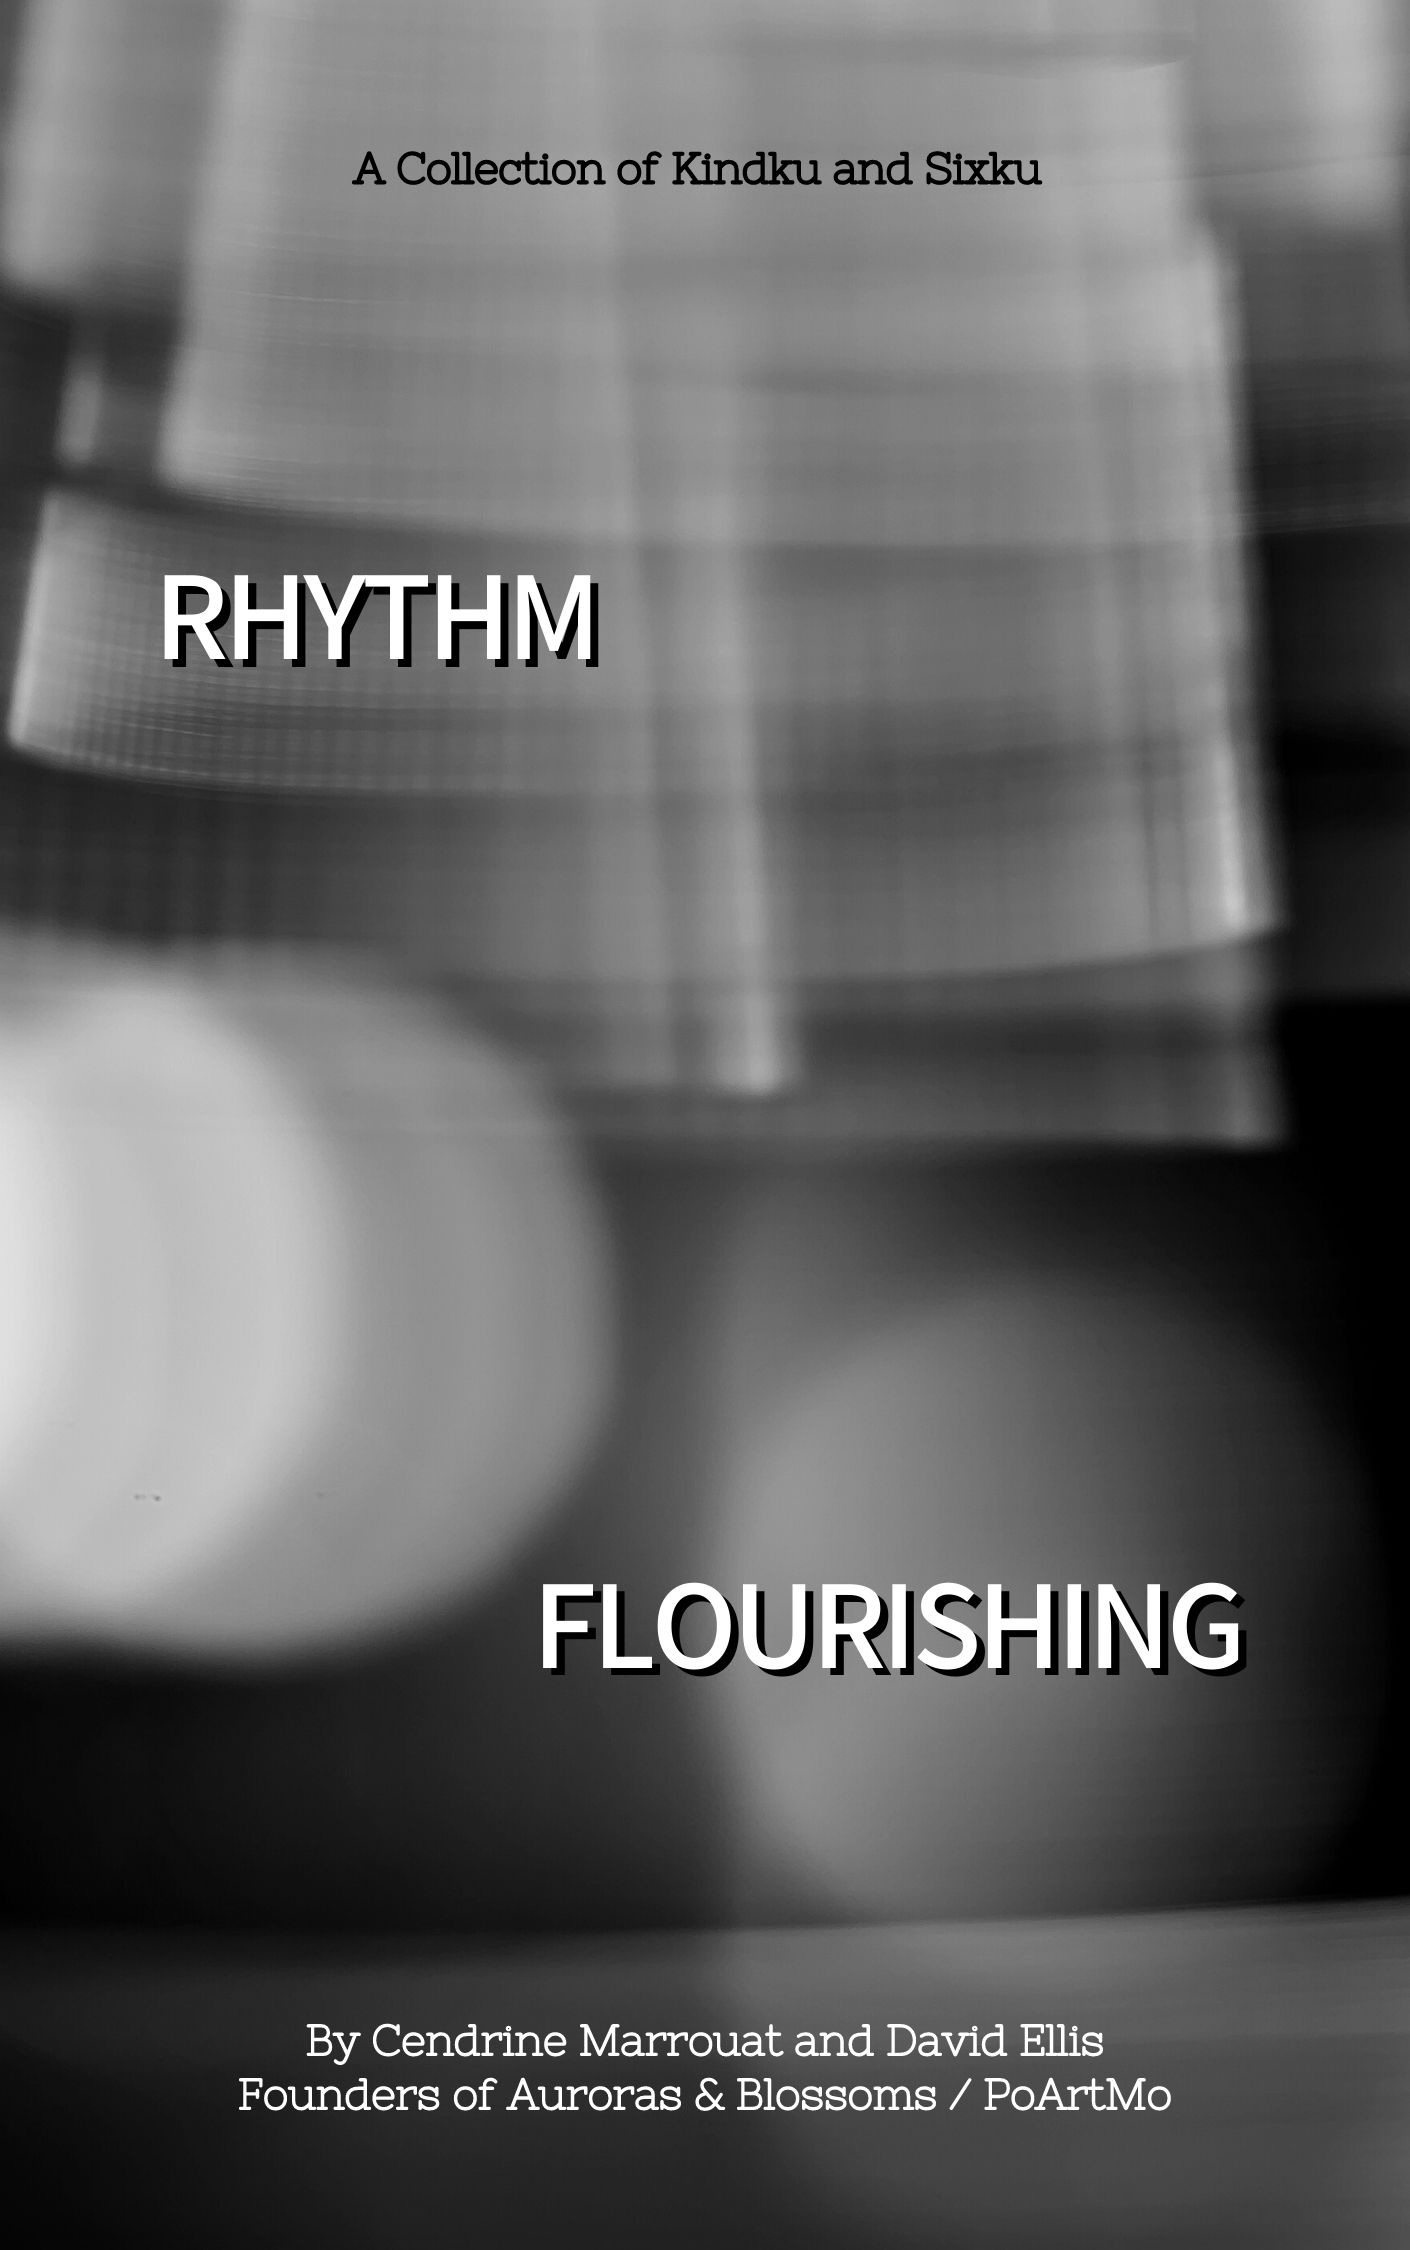 Rhythm Flourishing: A Collection of Kindku and Sixku's Ebook Image